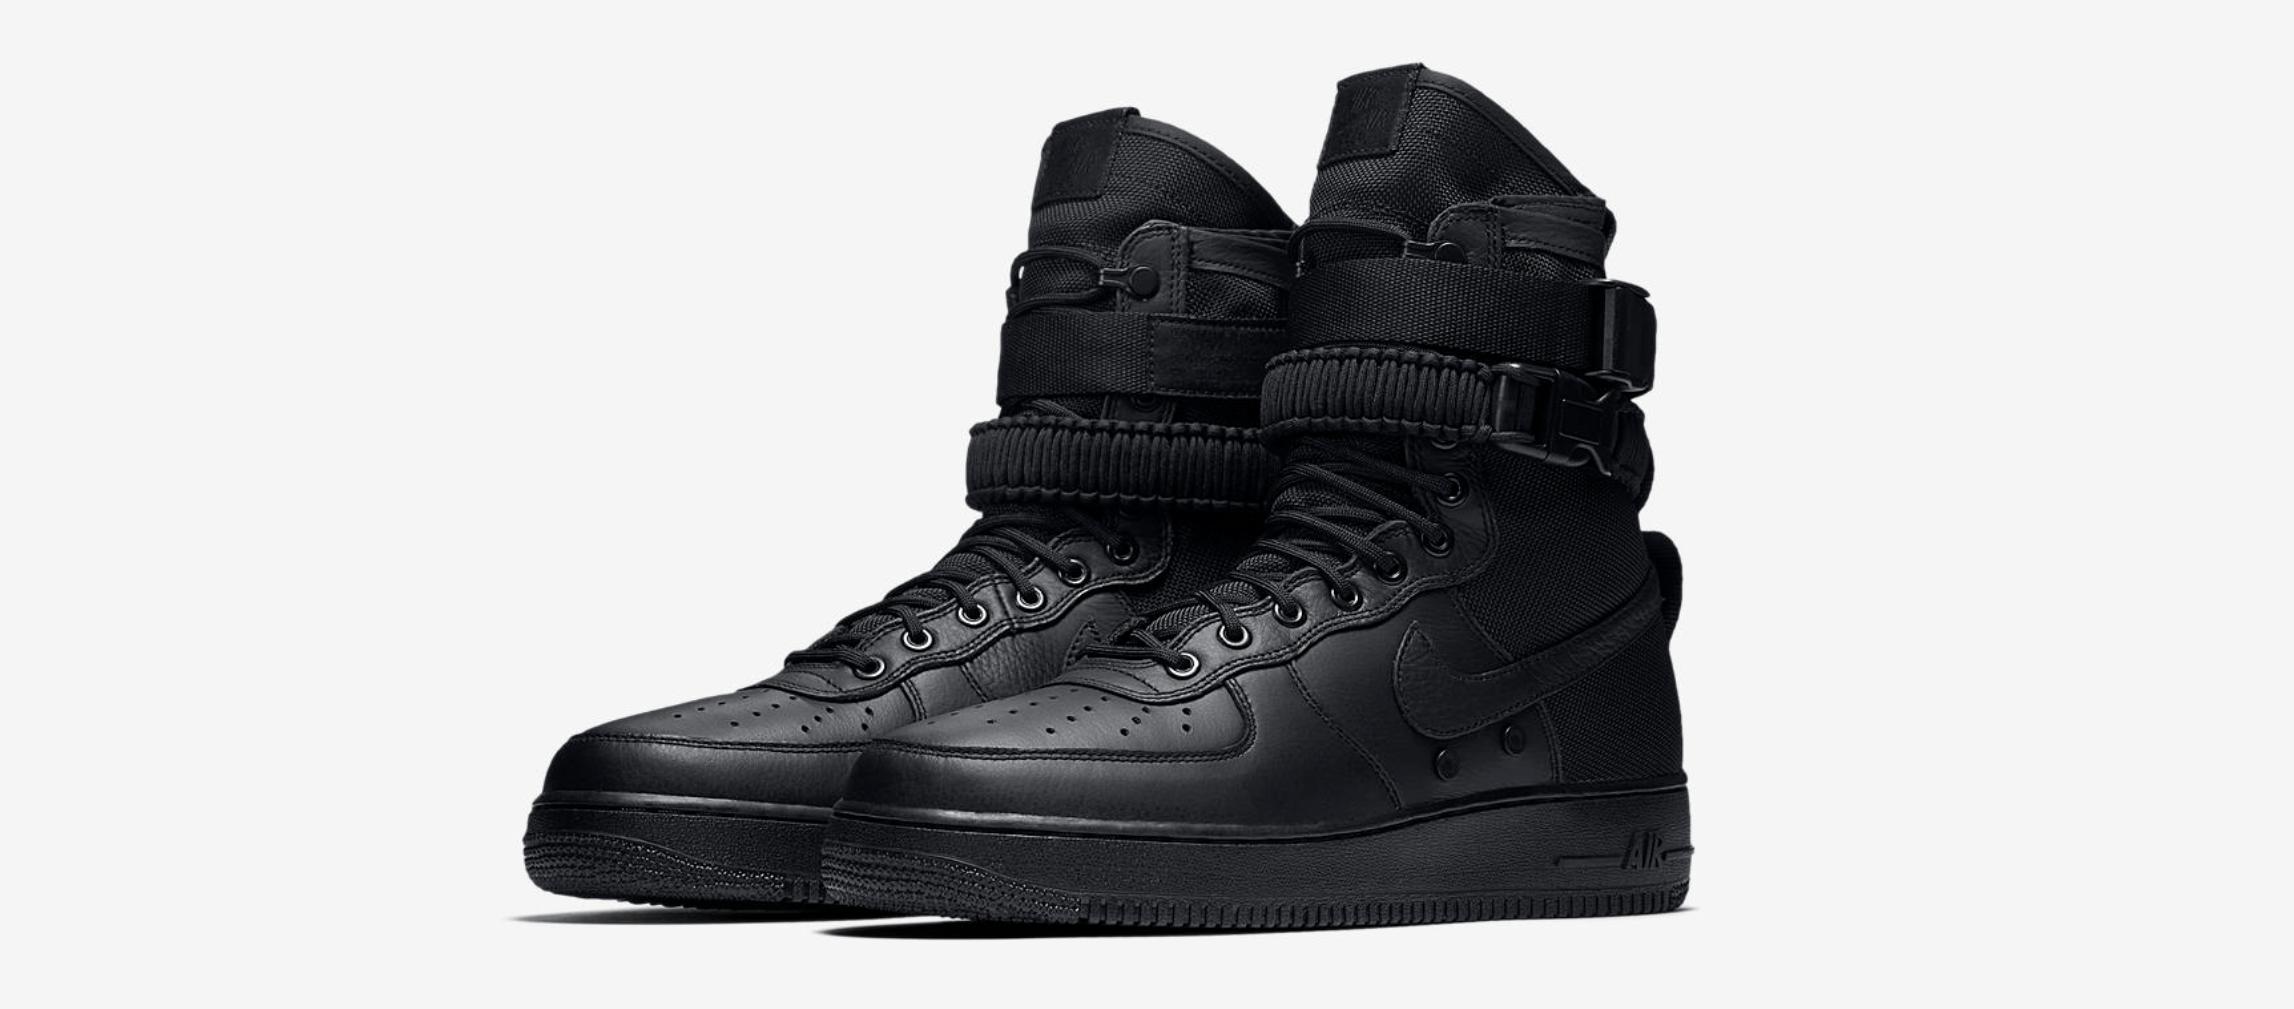 ad3a005d2d0fd5 The Nike SF-AF1  Triple Black  Drops Next Week - WearTesters